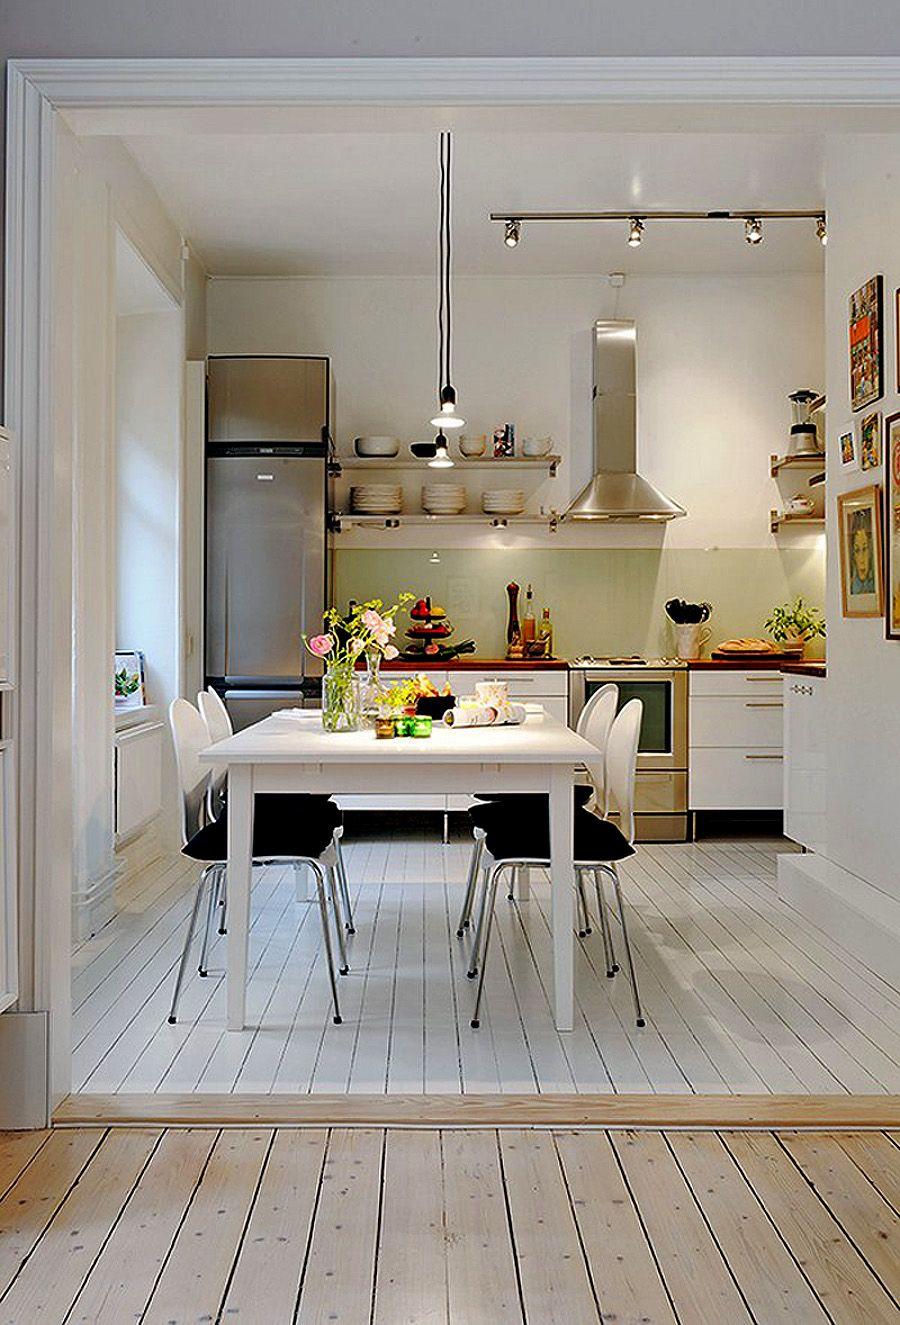 Home Design and Interior Design Gallery of